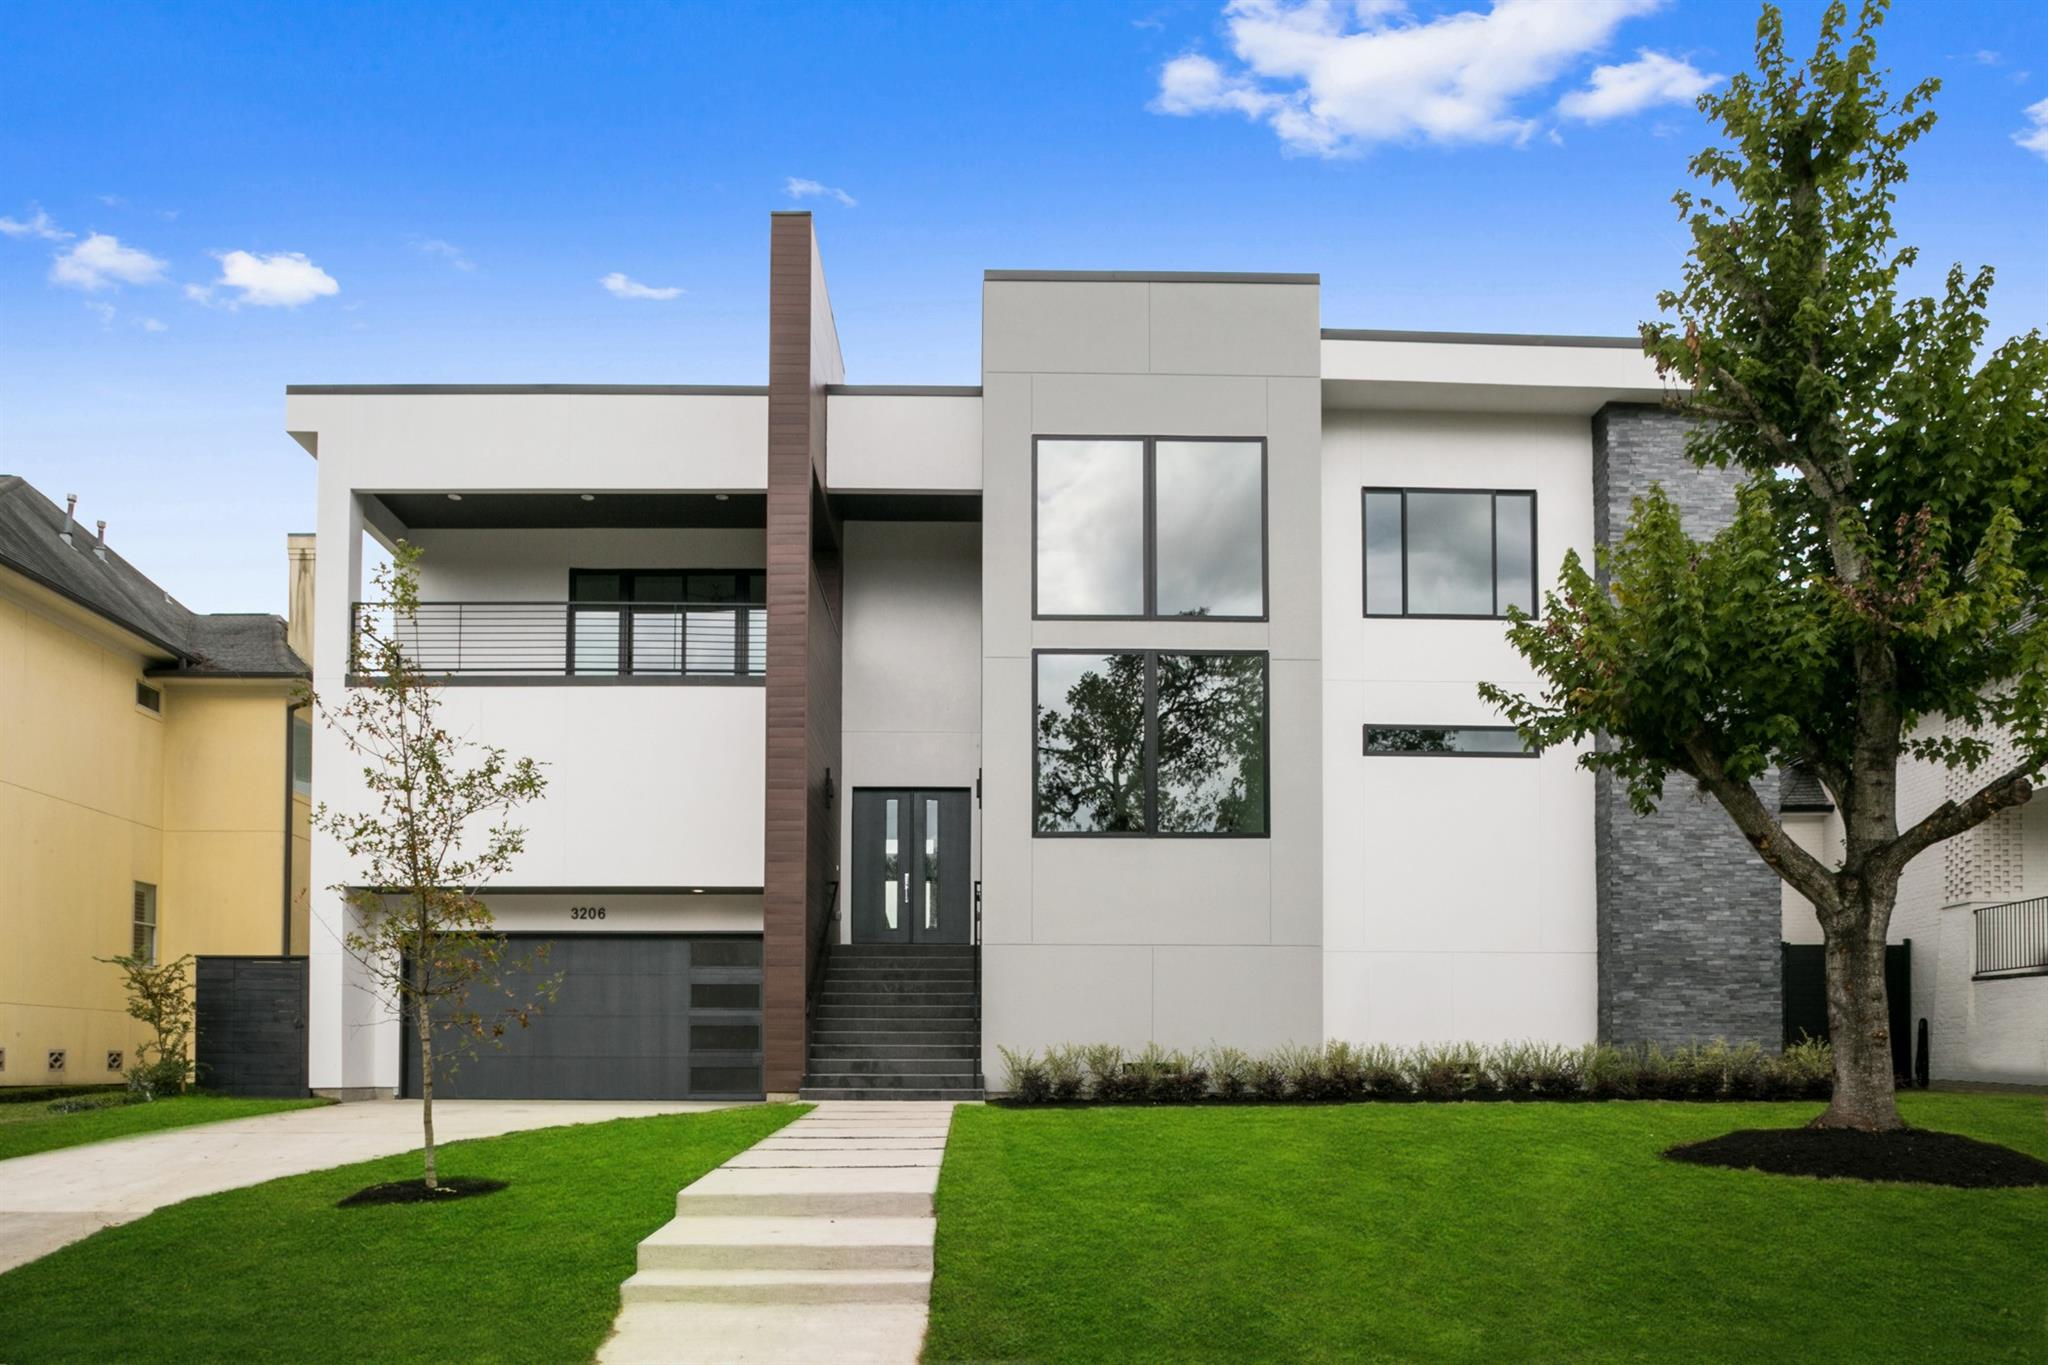 3206 Merrick Street Property Photo - Houston, TX real estate listing